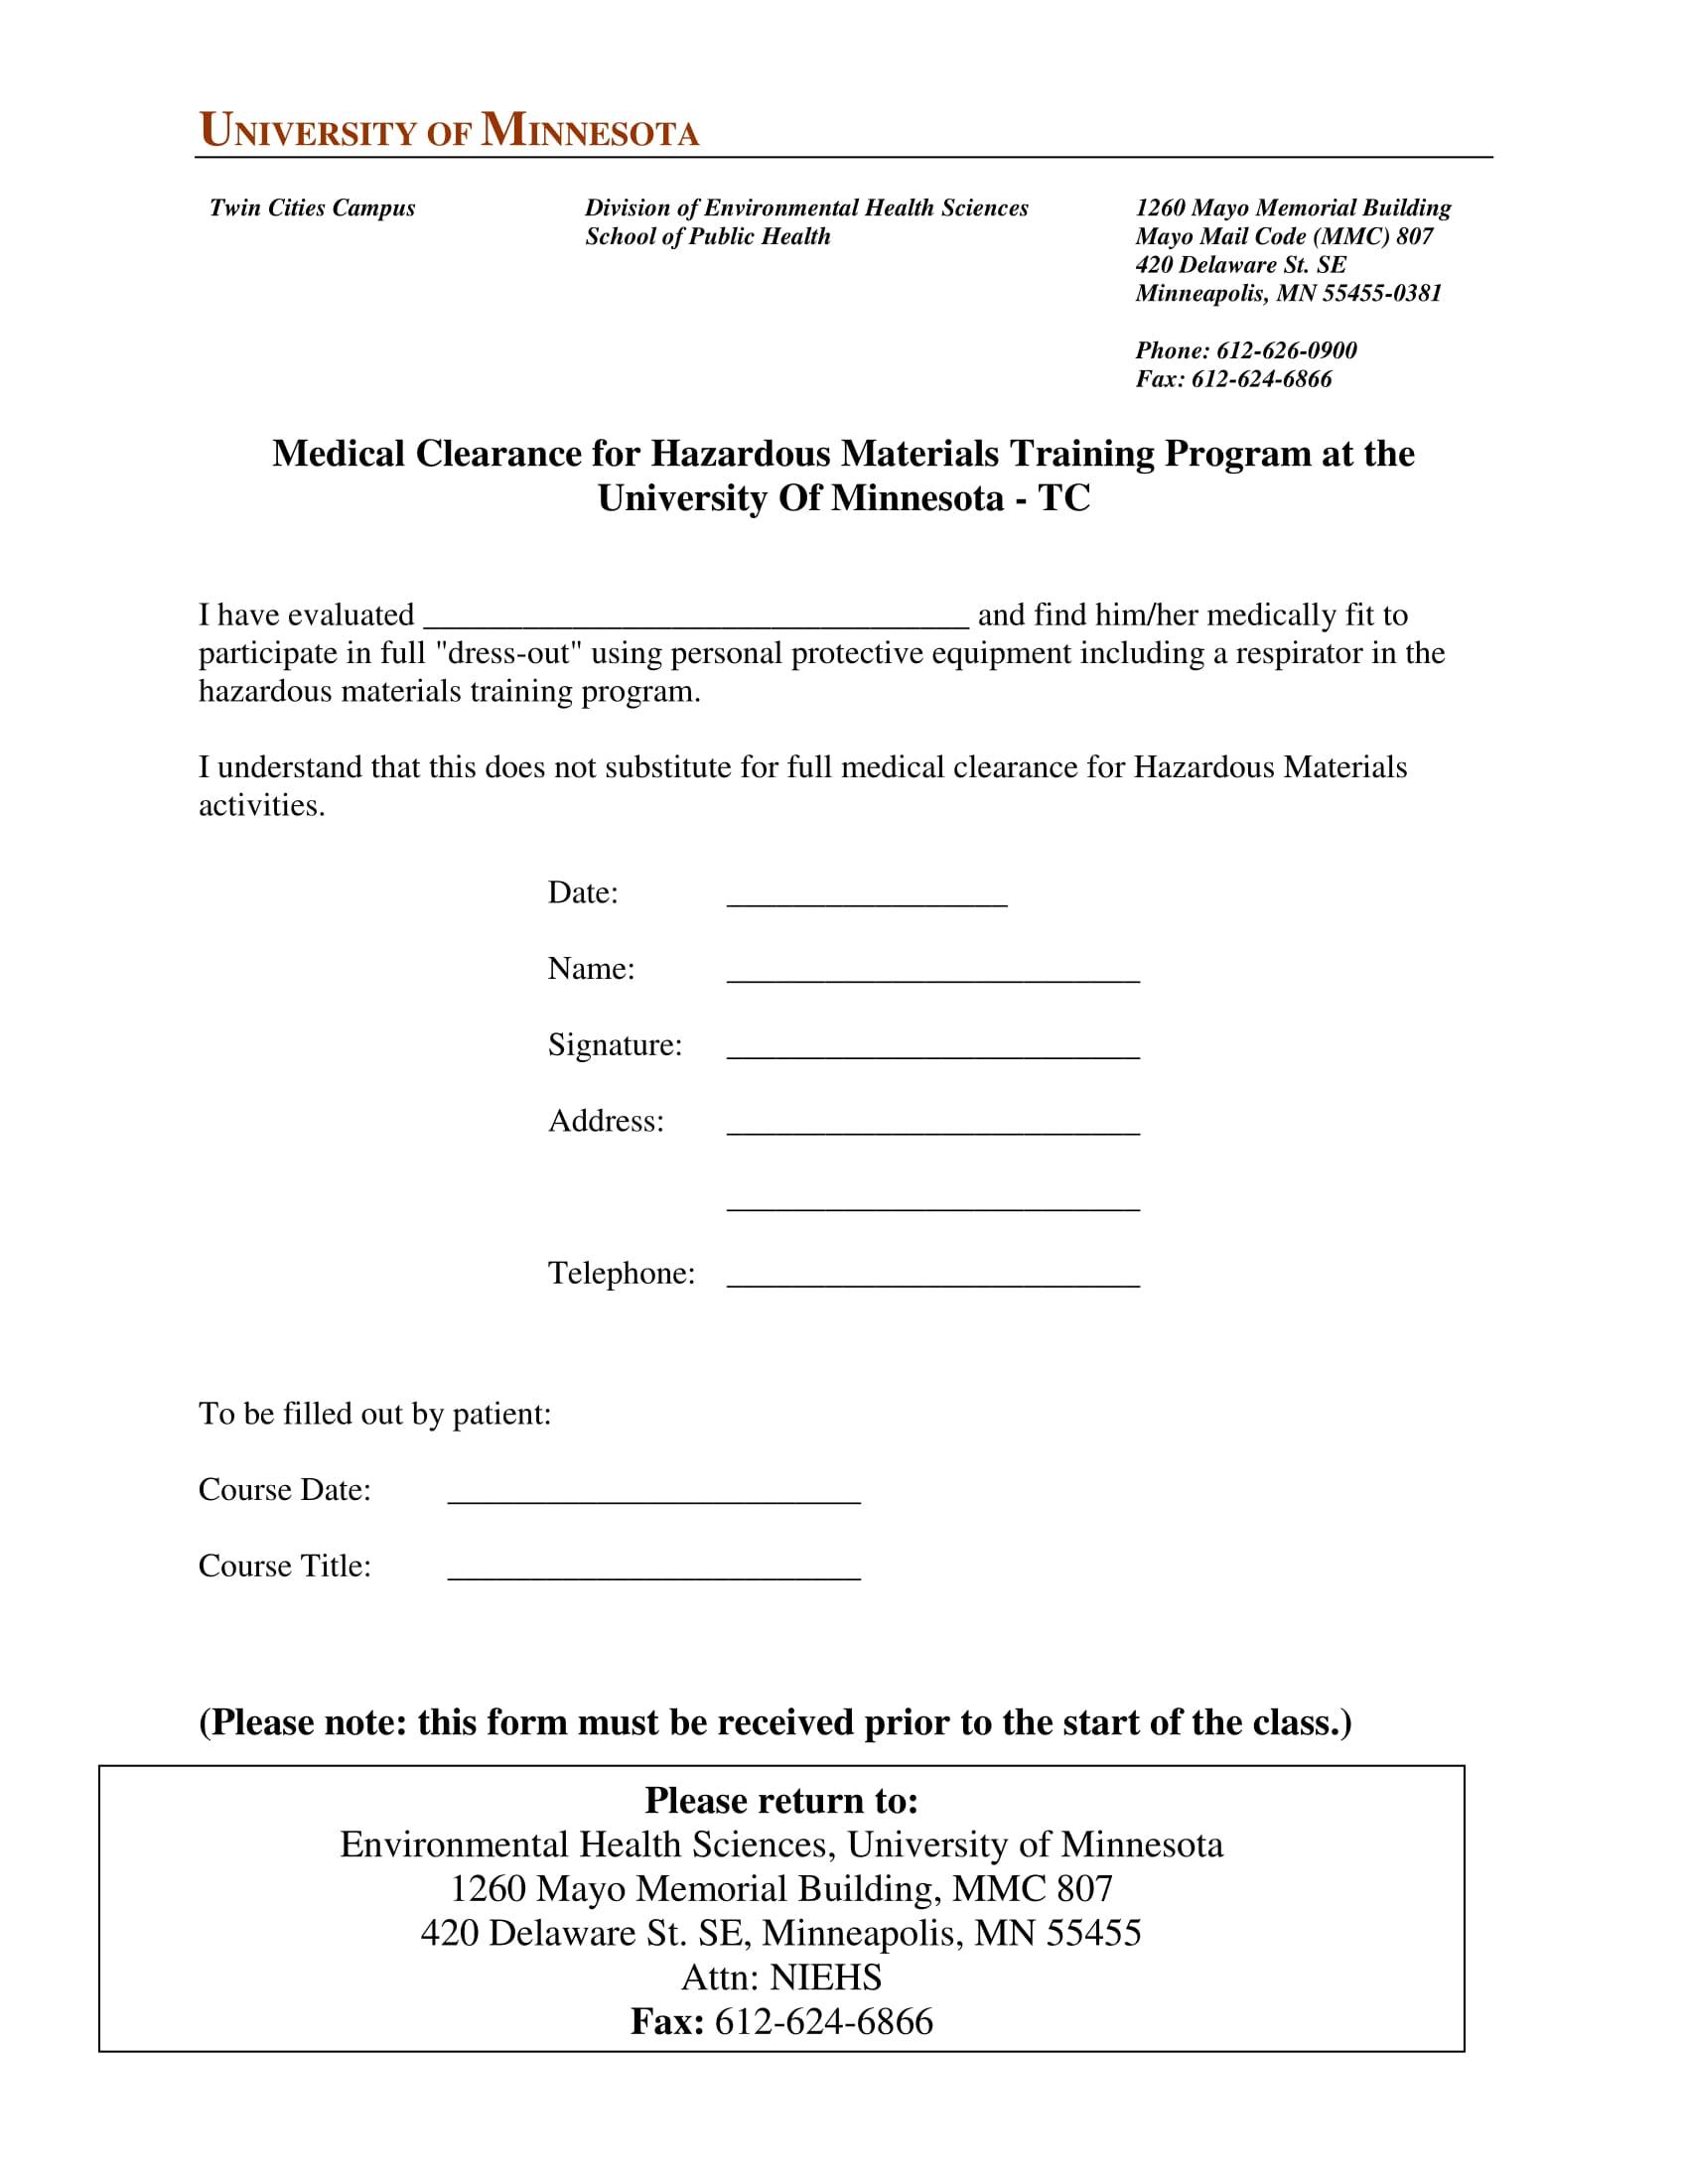 training program medical clearance form 4